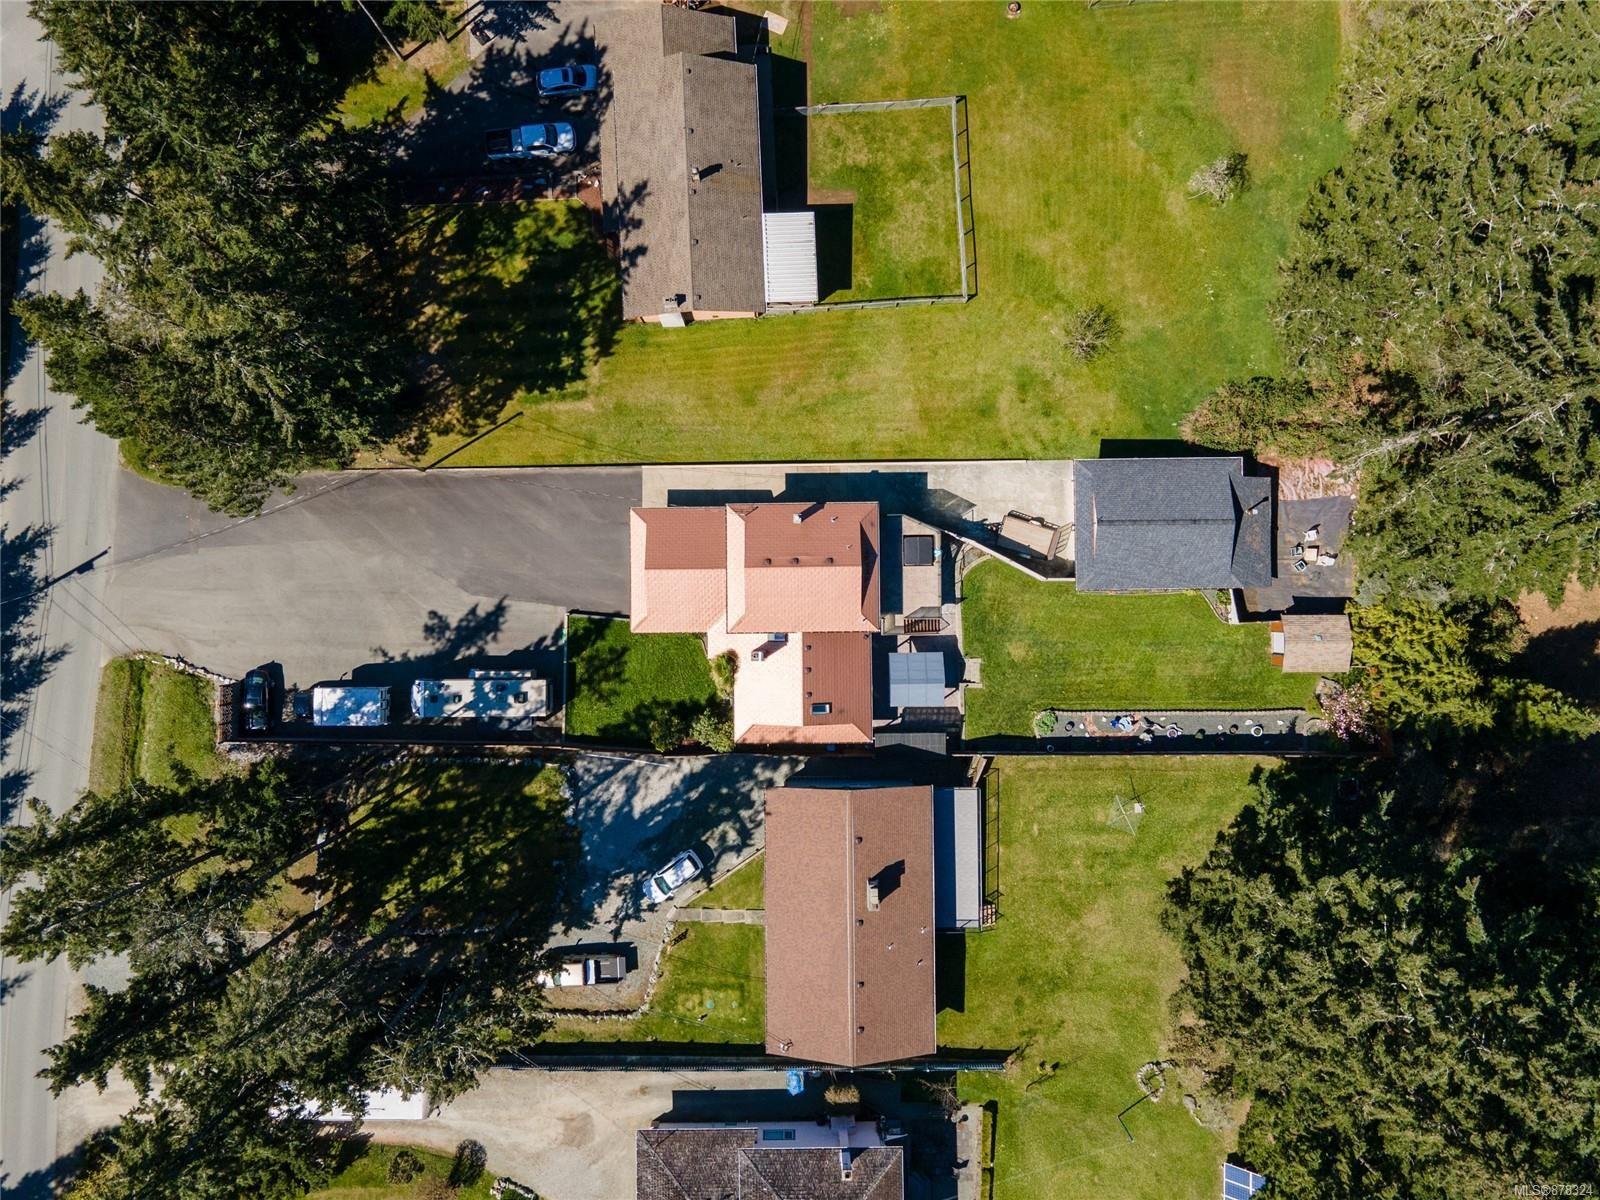 Photo 52: Photos: 3875 Moore Rd in : PA Port Alberni House for sale (Port Alberni)  : MLS®# 878324